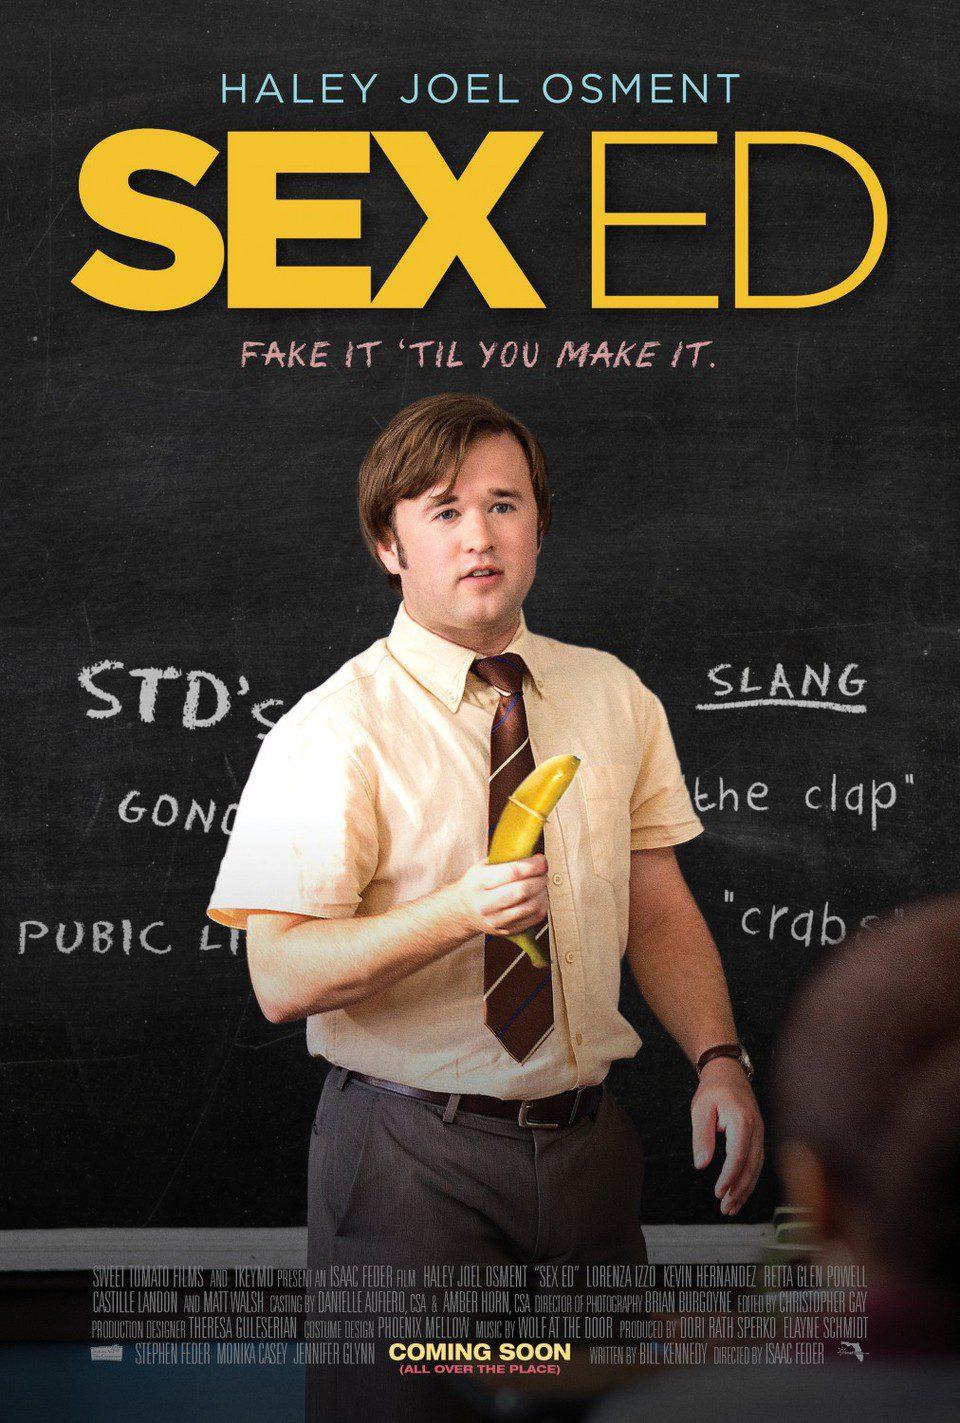 Estados Unidos poster for Sex Ed